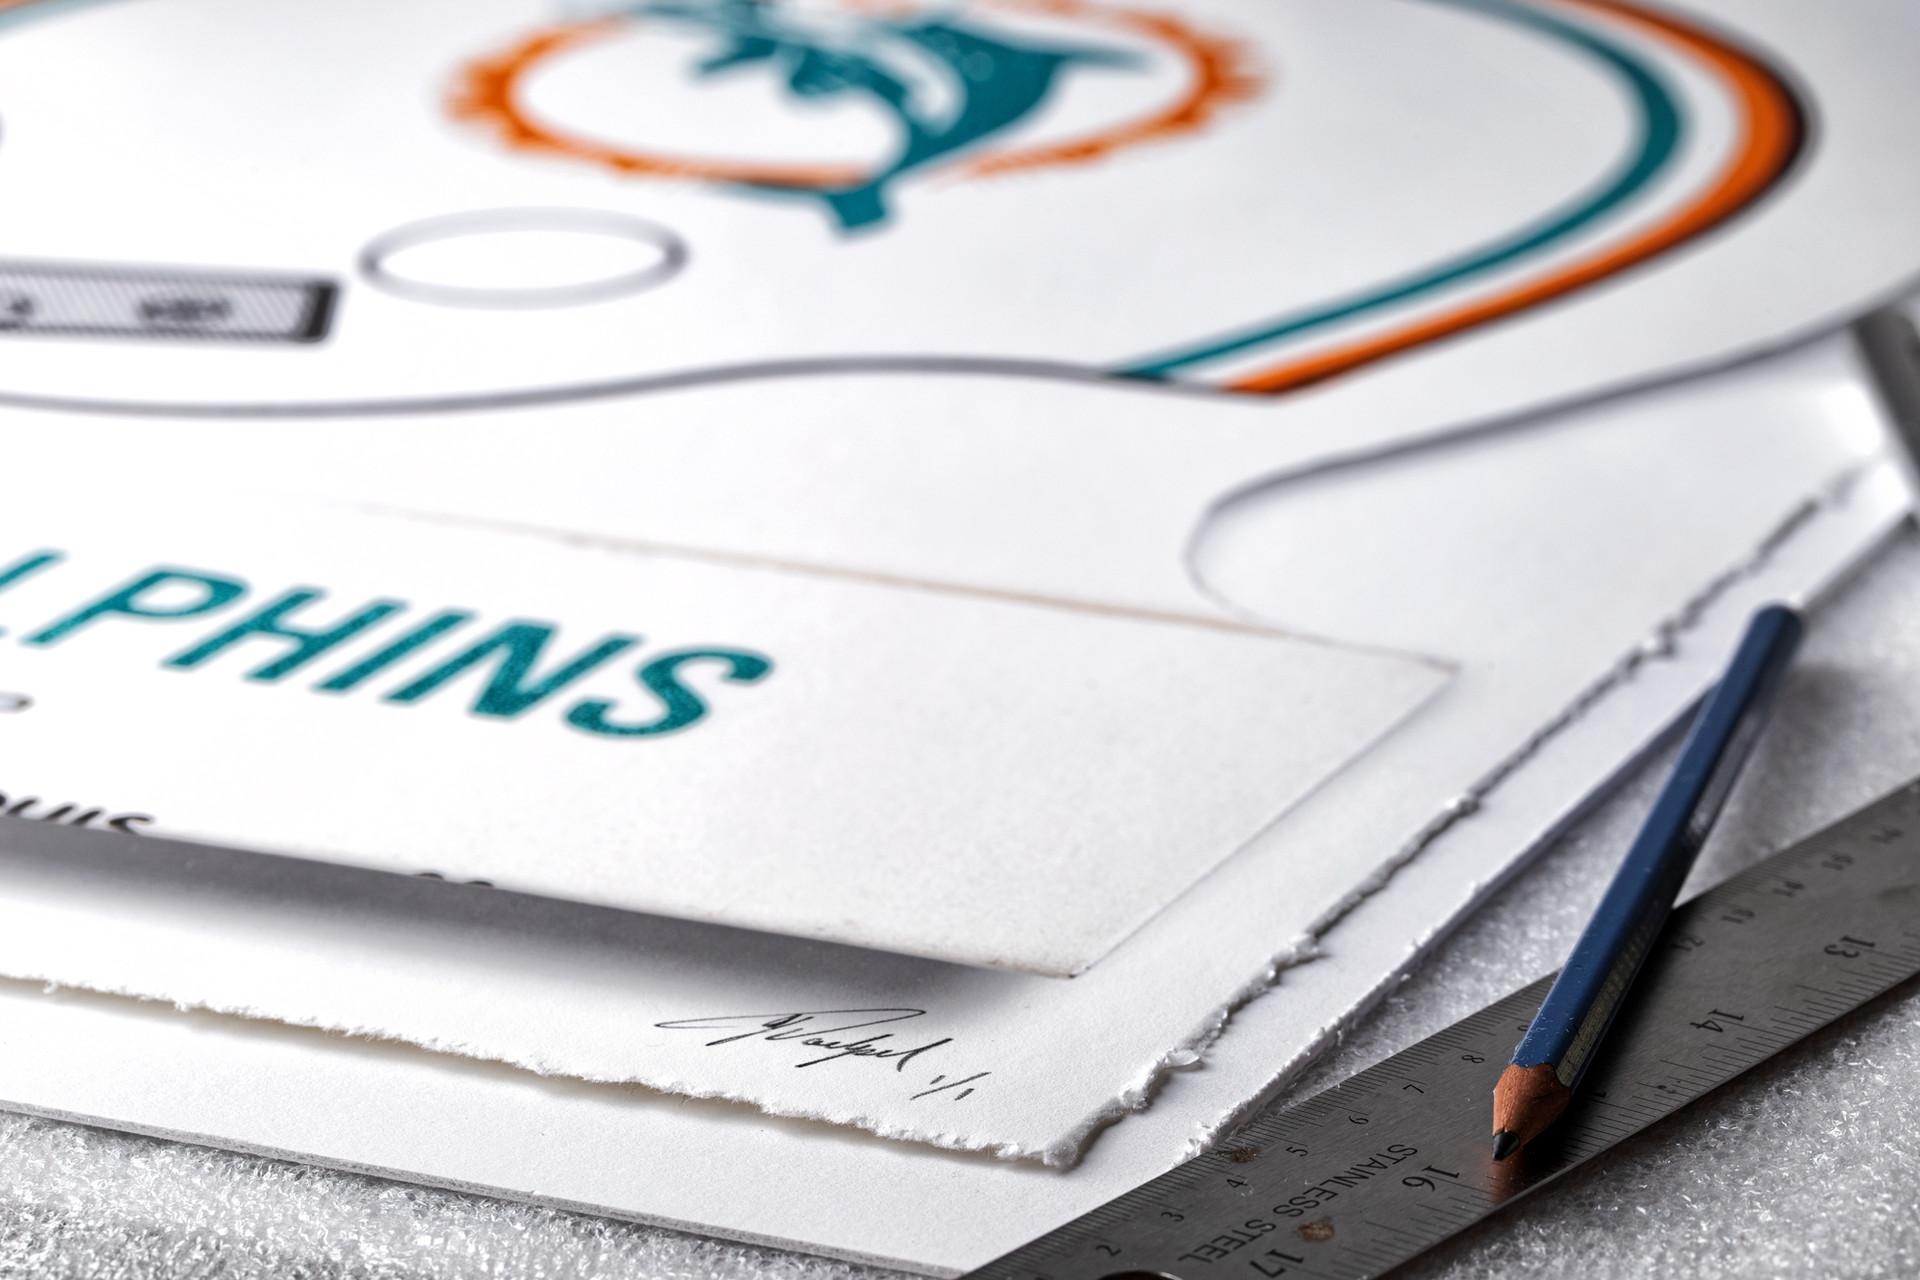 miami-dolphins-art-matchbook-gift-framed